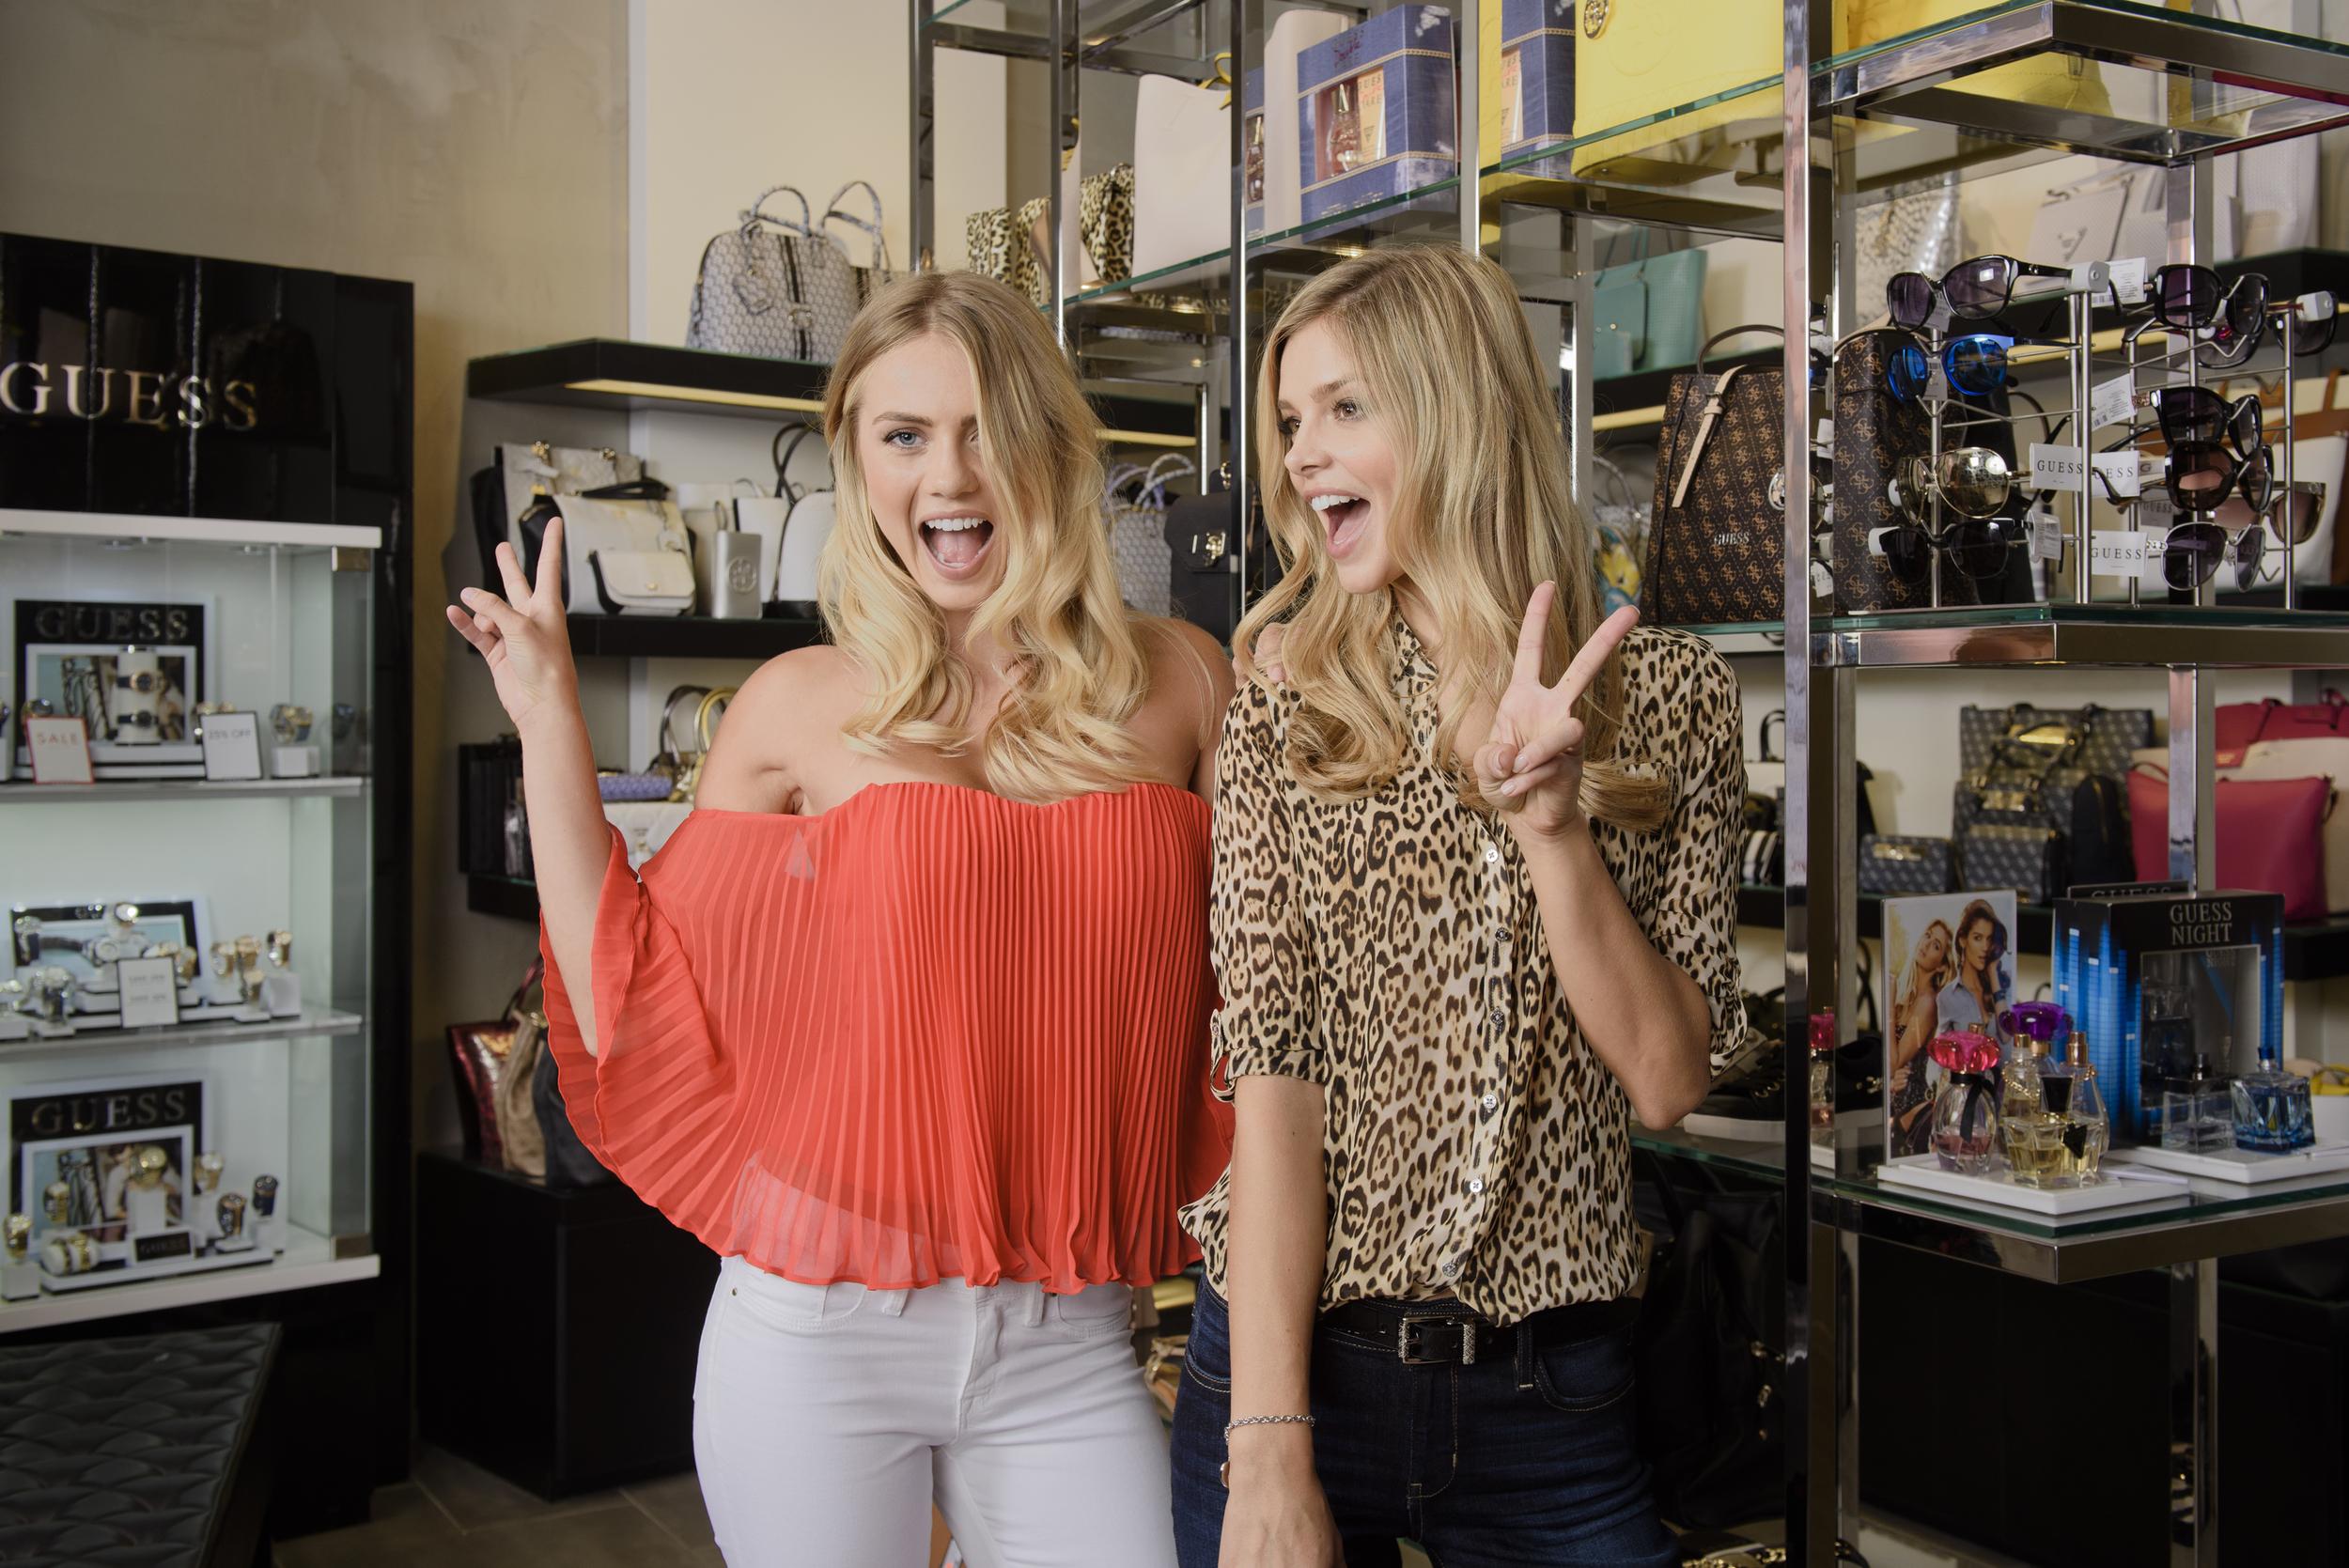 GUESS_Danielle Knudson & Elyse Knowles_21.1.16-8.jpg